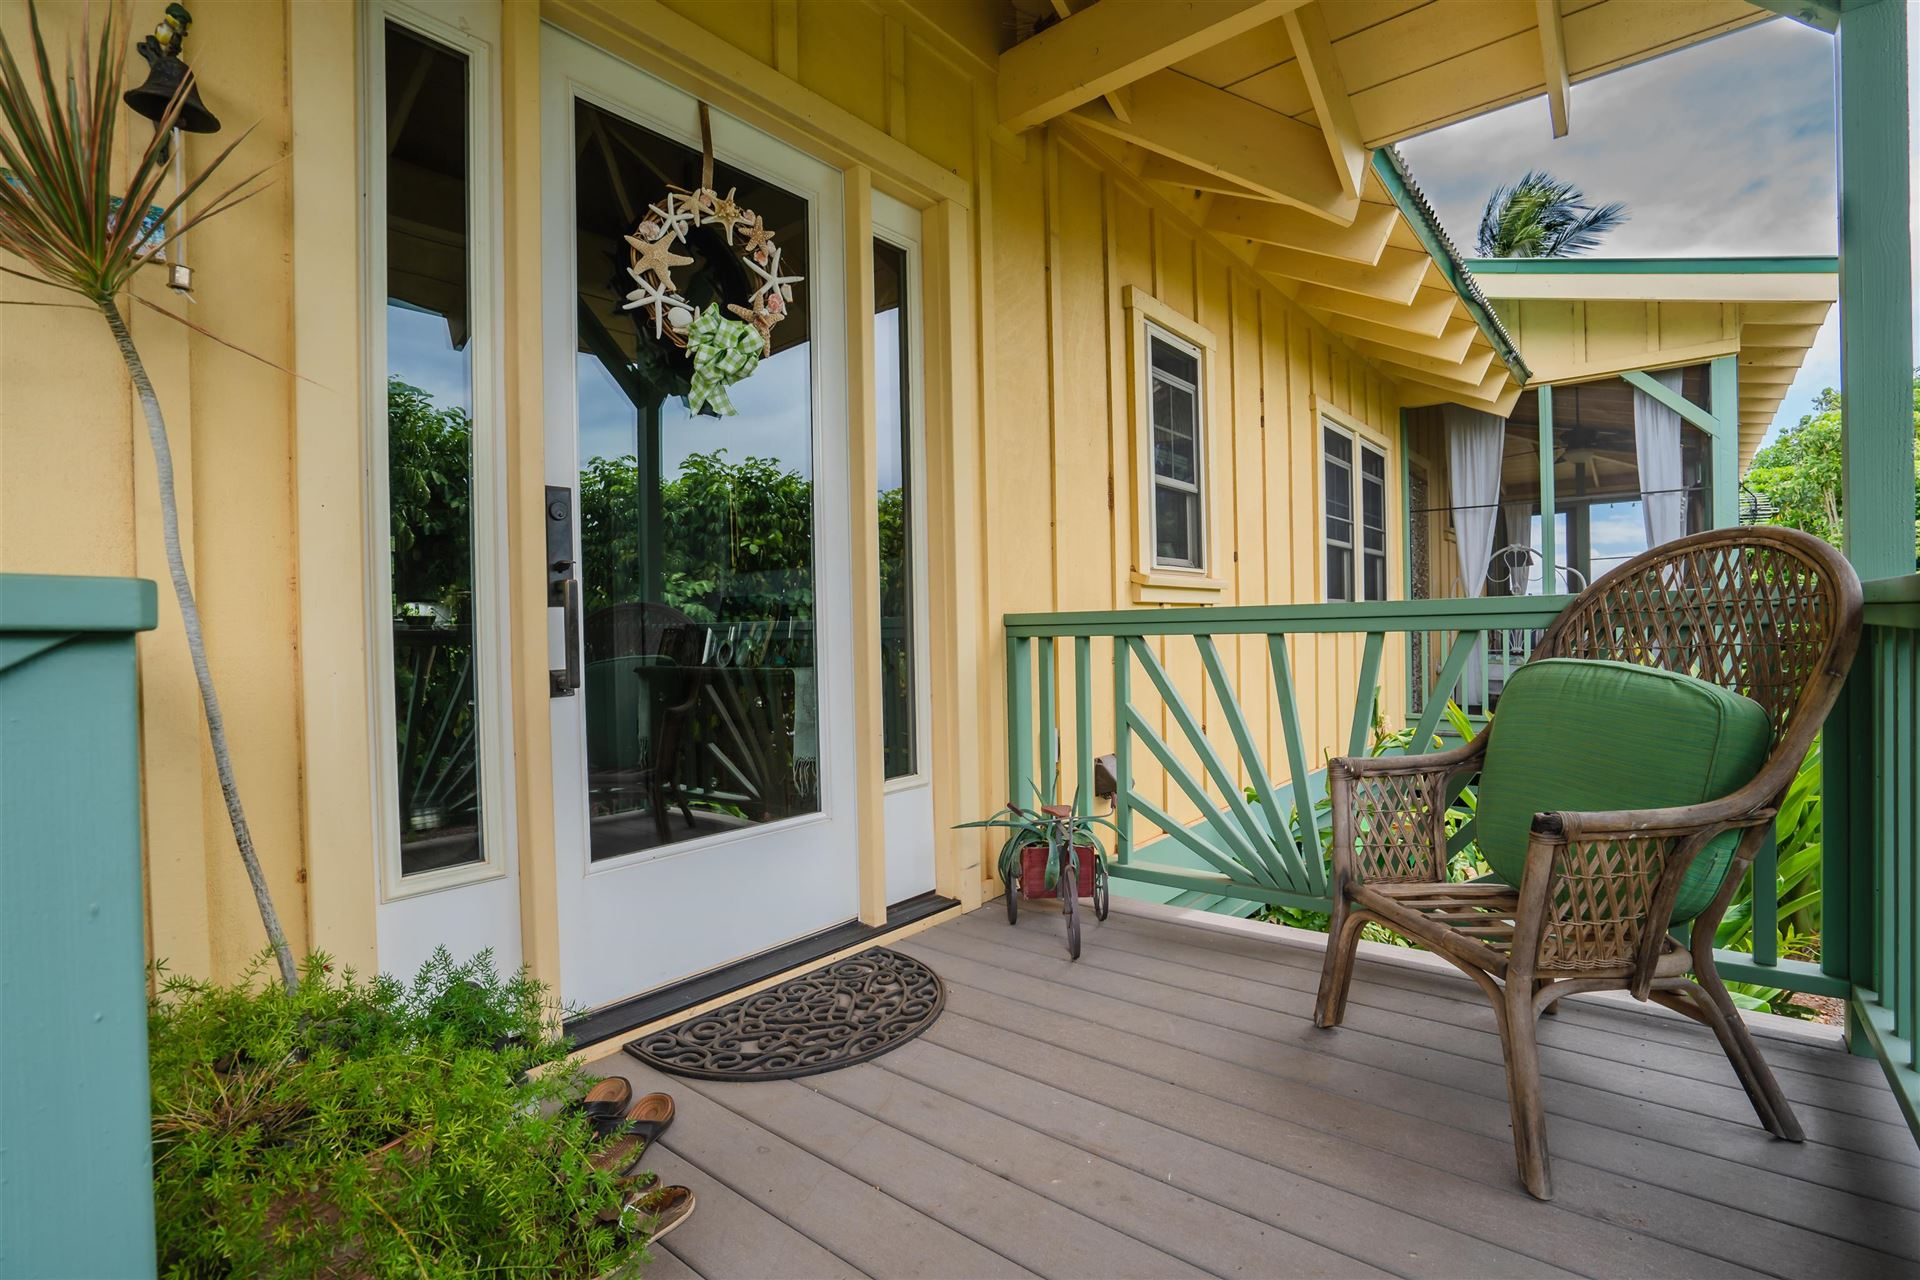 Photo of 2464 Kamehameha V Hwy, Kaunakakai, HI 96748-1268 (MLS # 393214)